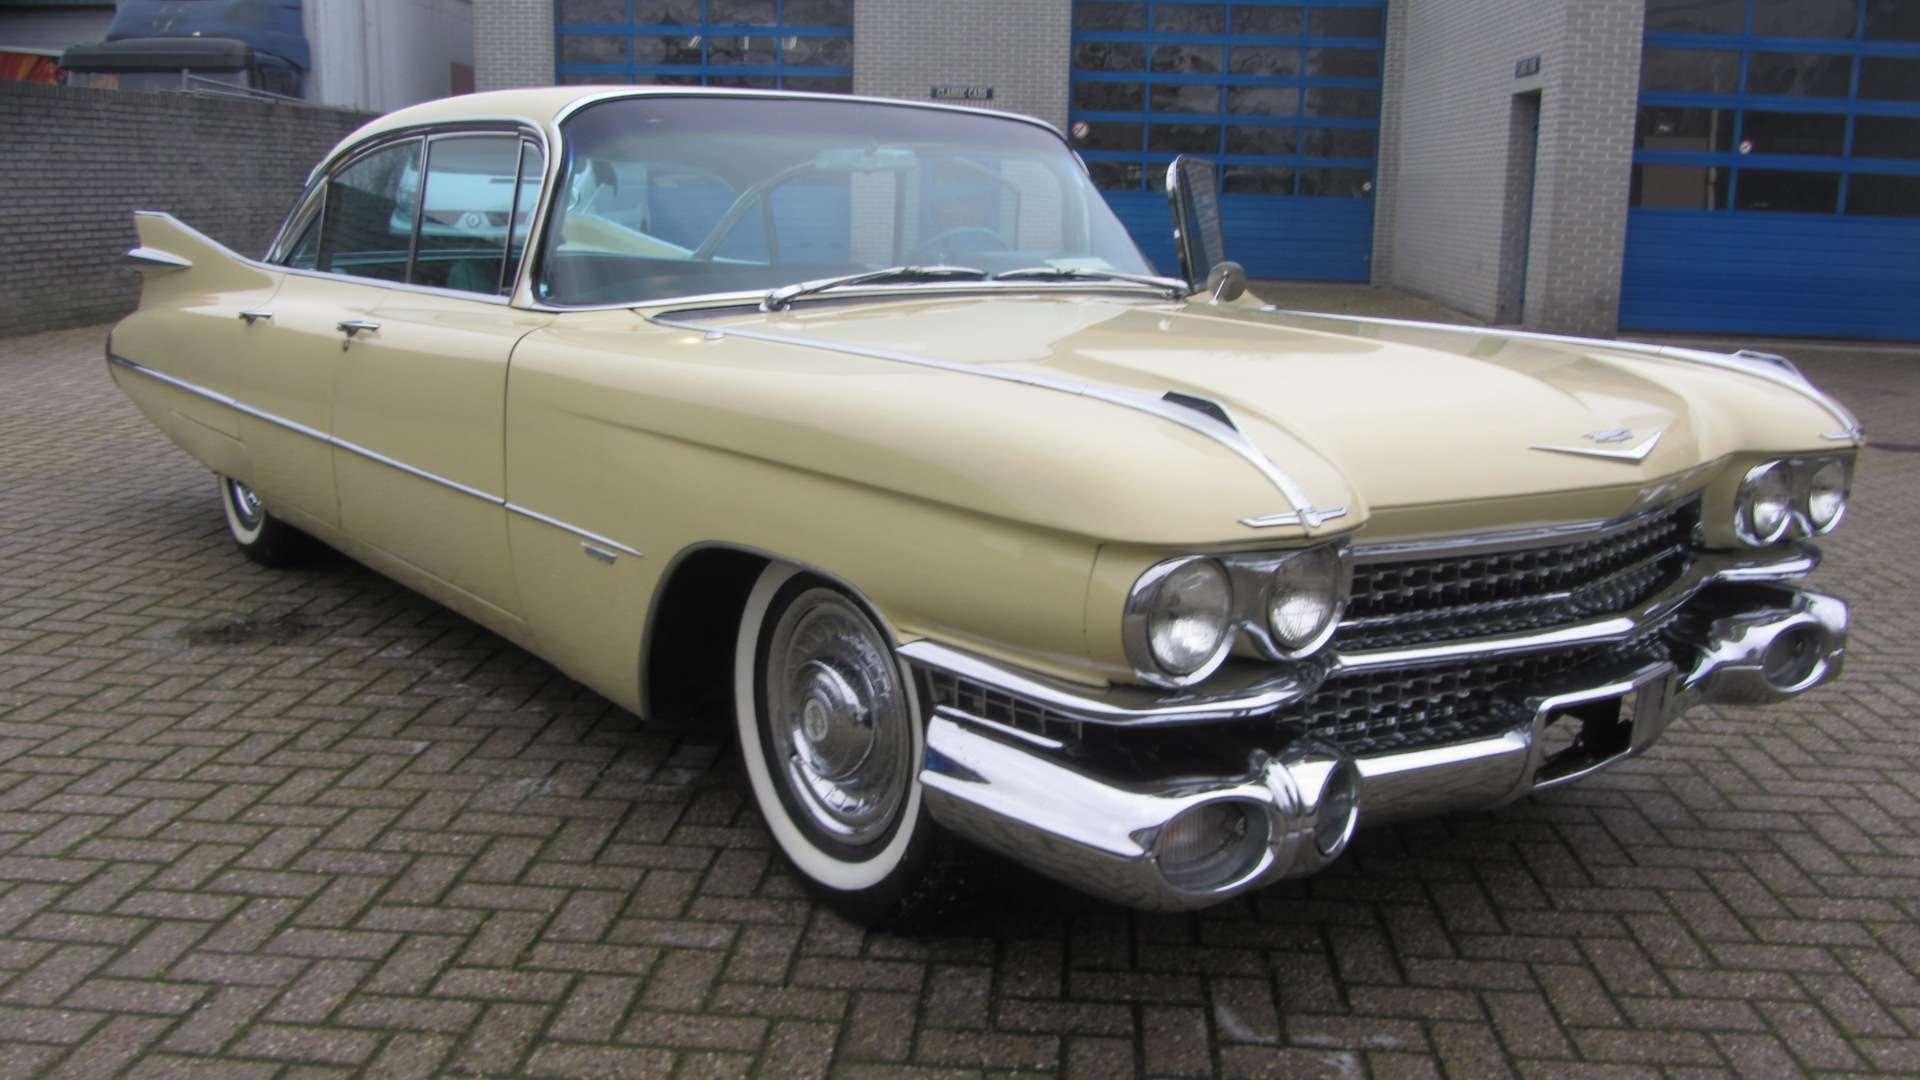 Cadillac Sedan de Ville 1959 & 50 USA Classics For Sale (picture 2 of 6)